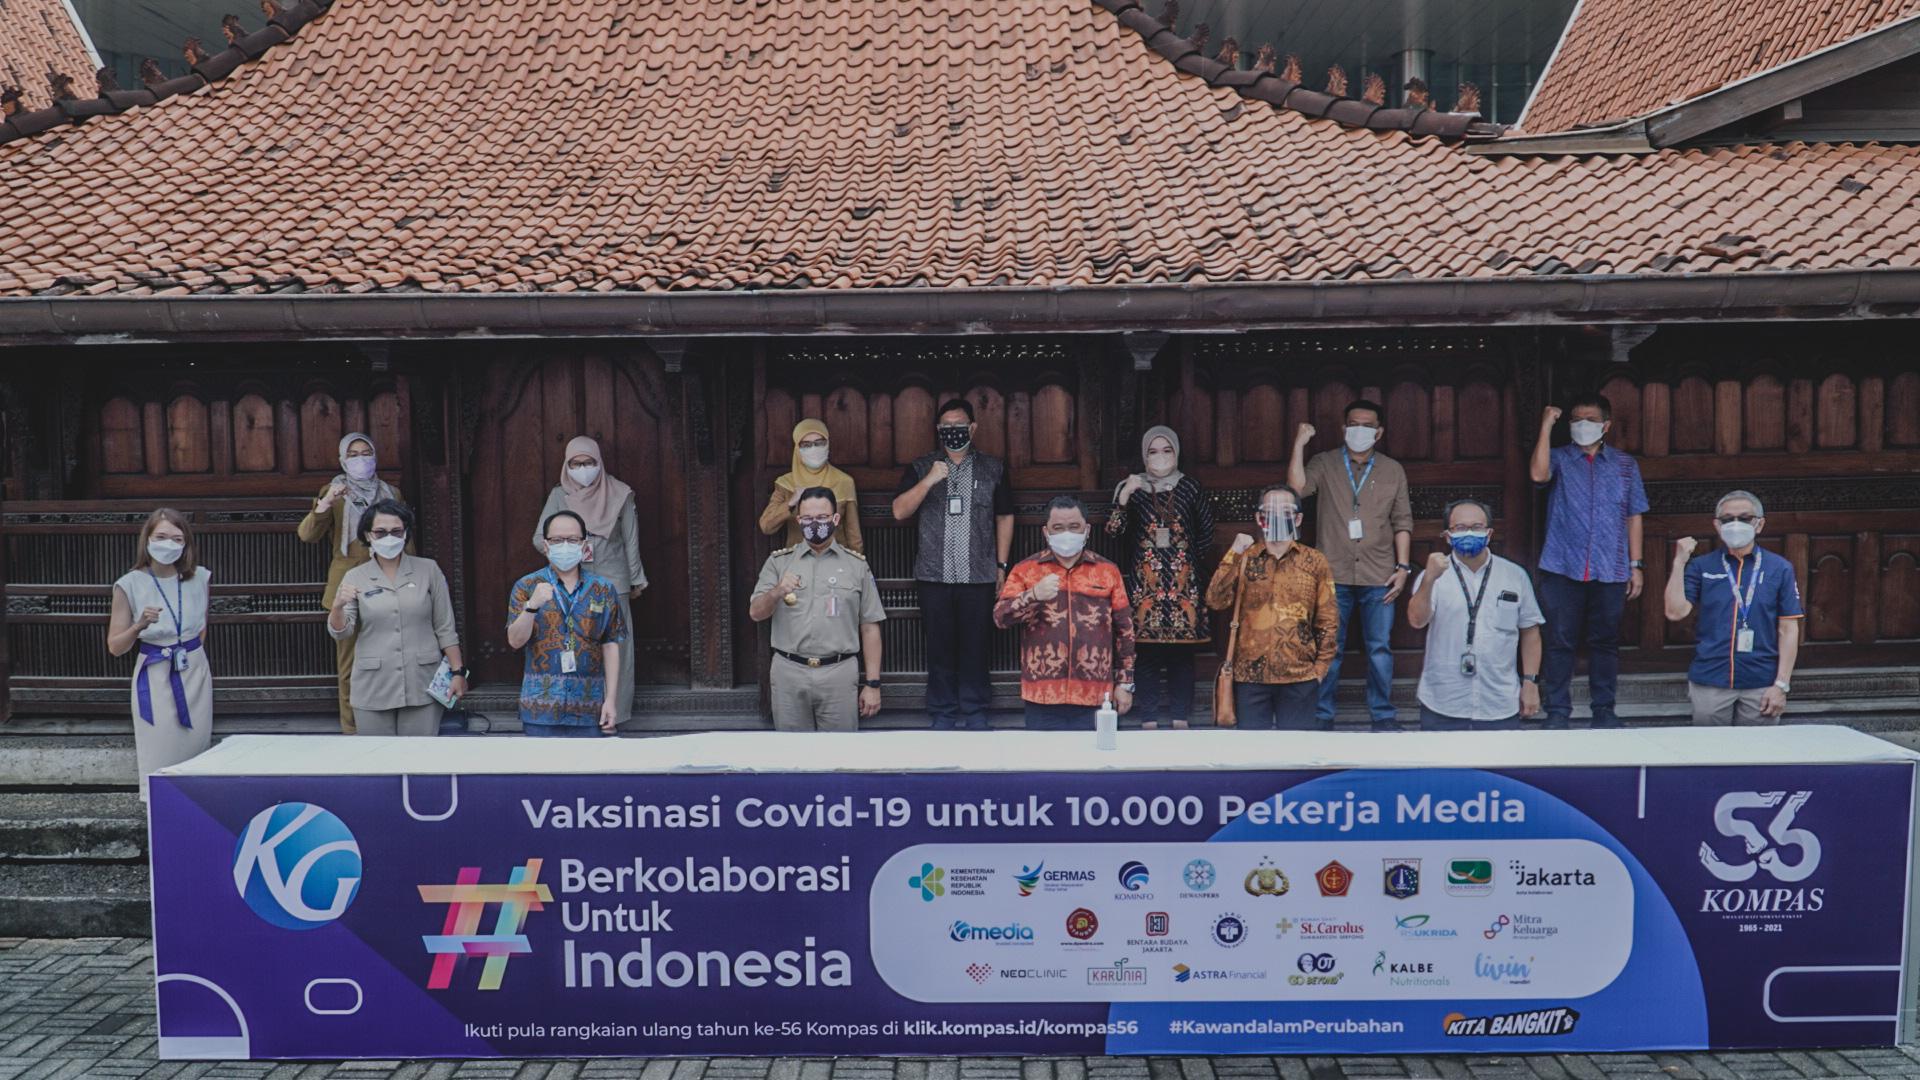 #BERKOLABORASIUNTUKINDONESIA: DYAN IKUT SERTA DALAM VAKSINASI COVID-19 UNTUK 10.000 PEKERJA MEDIA